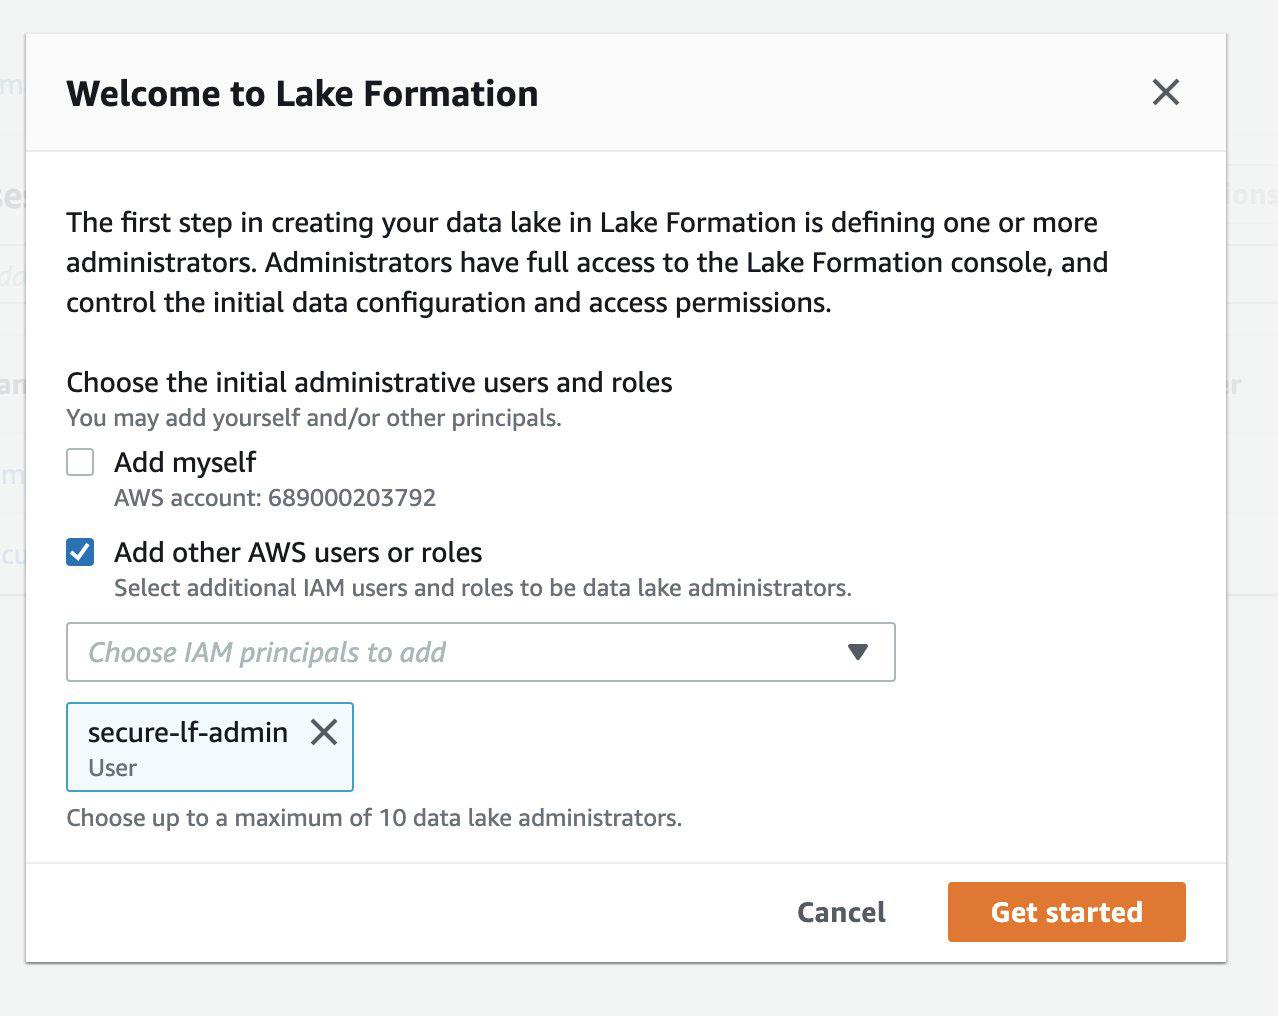 bdb1494 creating secure data lake 011